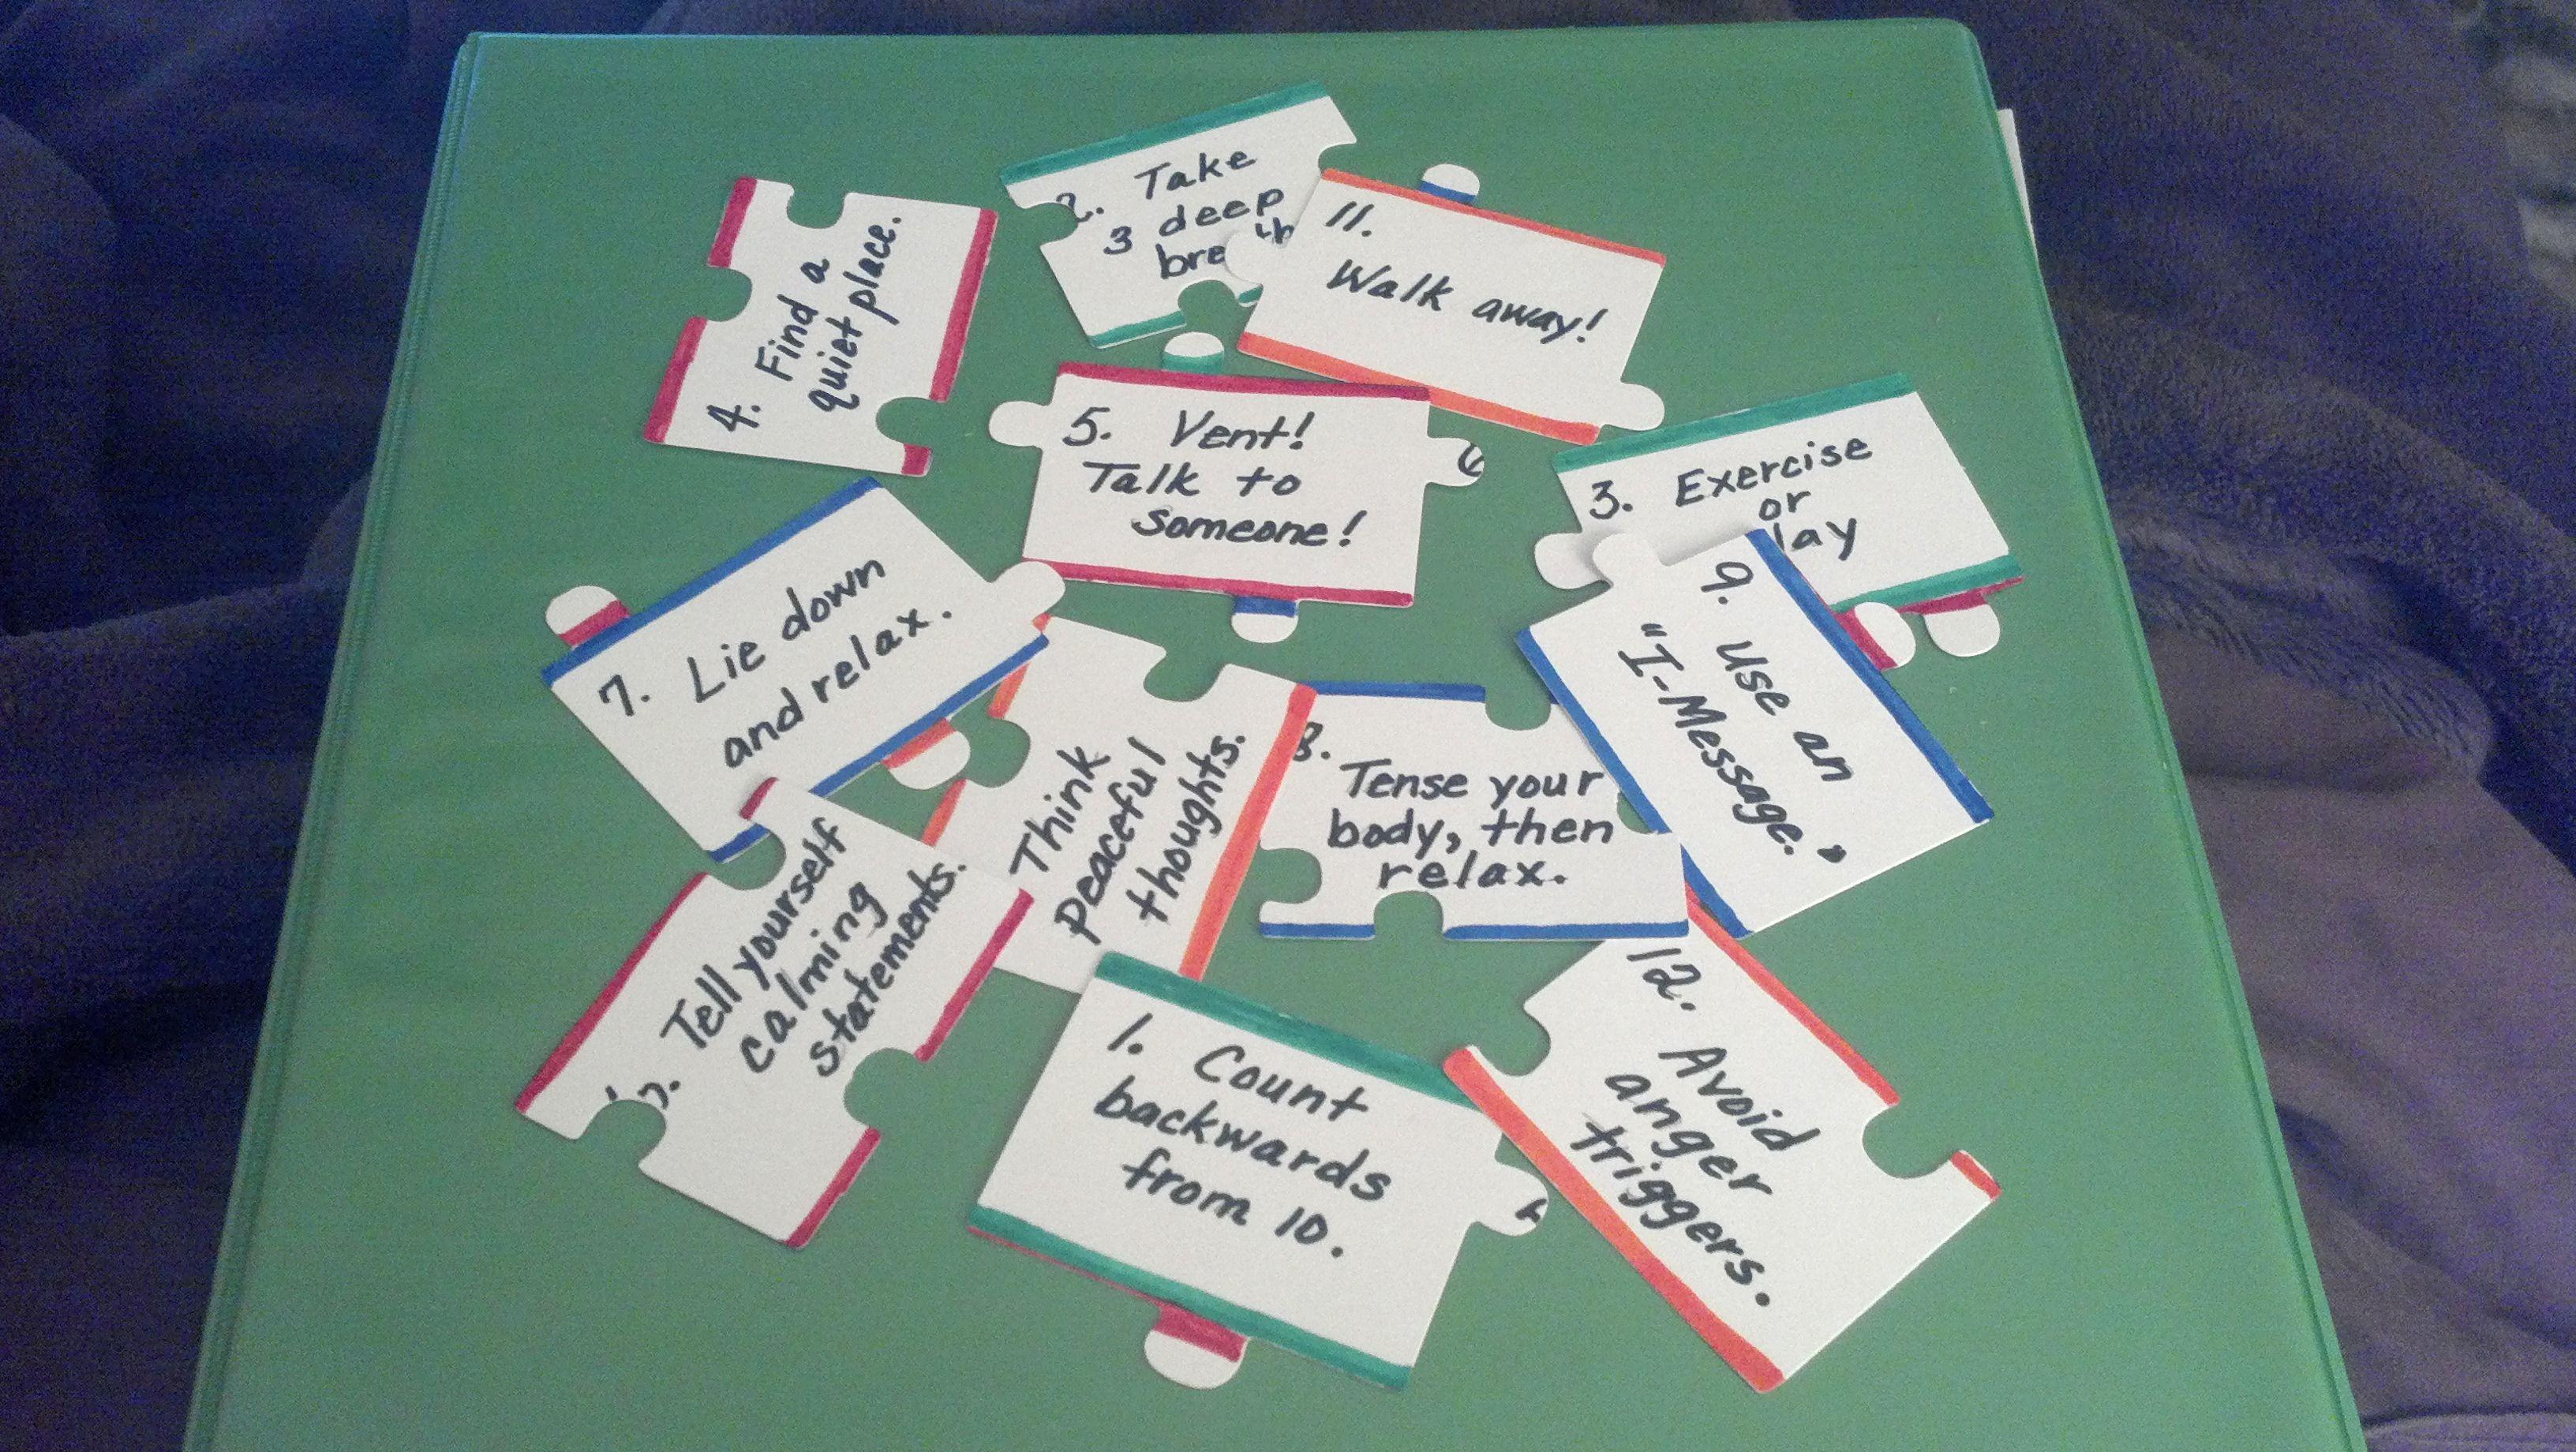 Puzzle Pieces To Discuss Anger Management